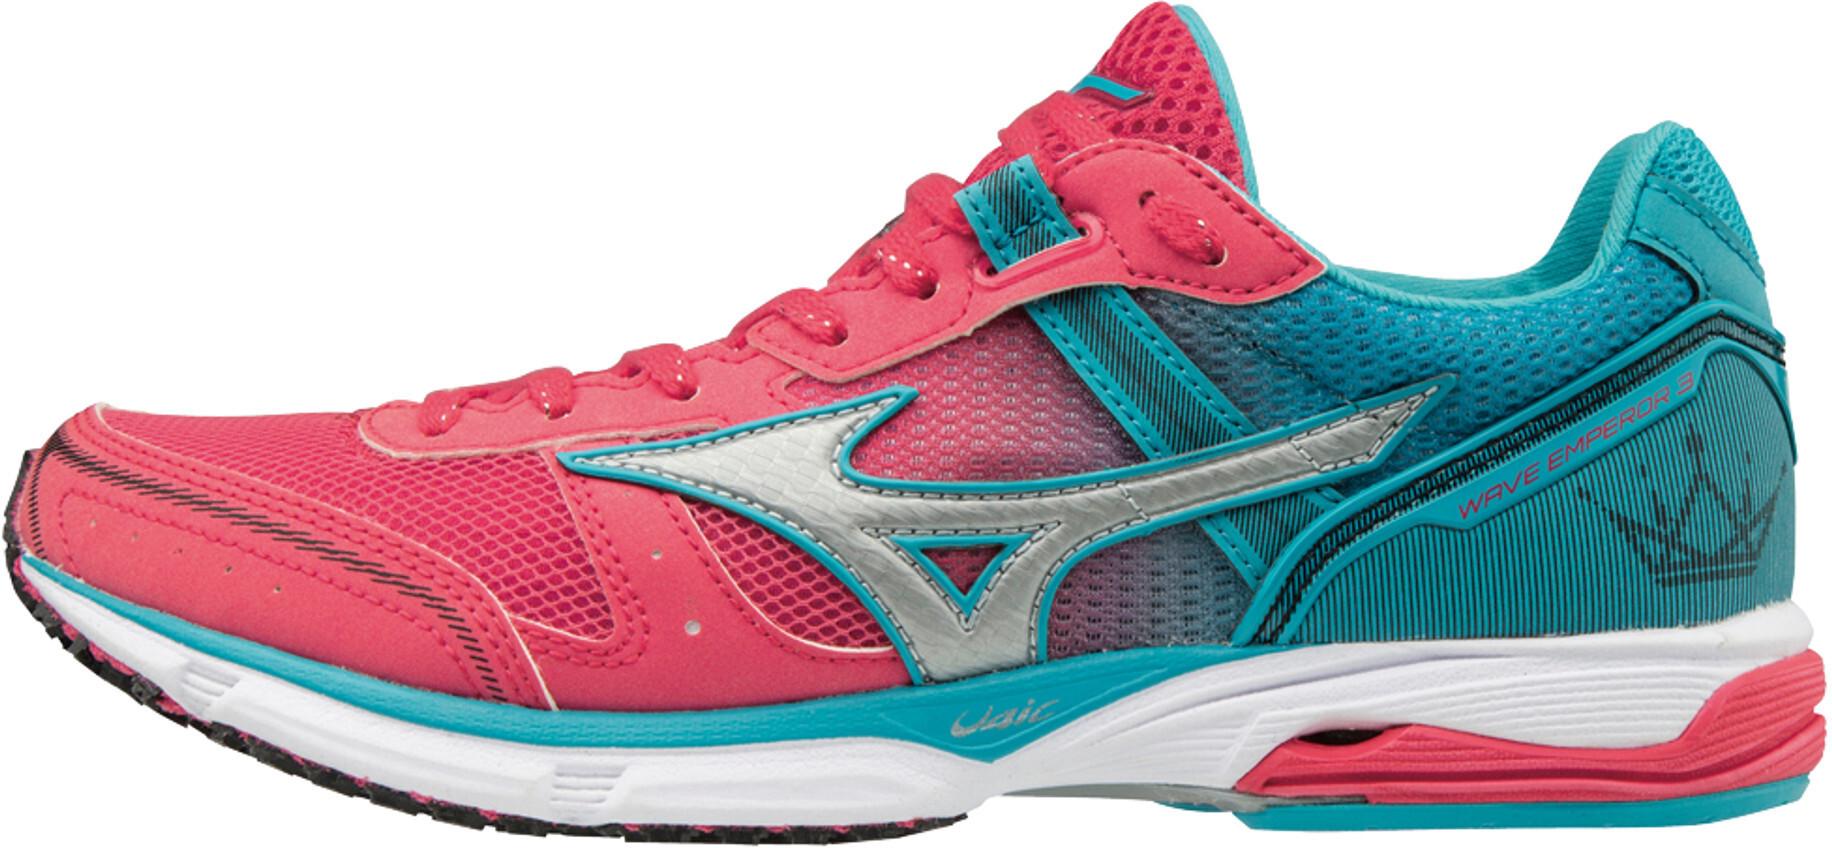 Wave Emperor Chaussures Roseturquoise 3 Mizuno Running Femme UMVSzpqG